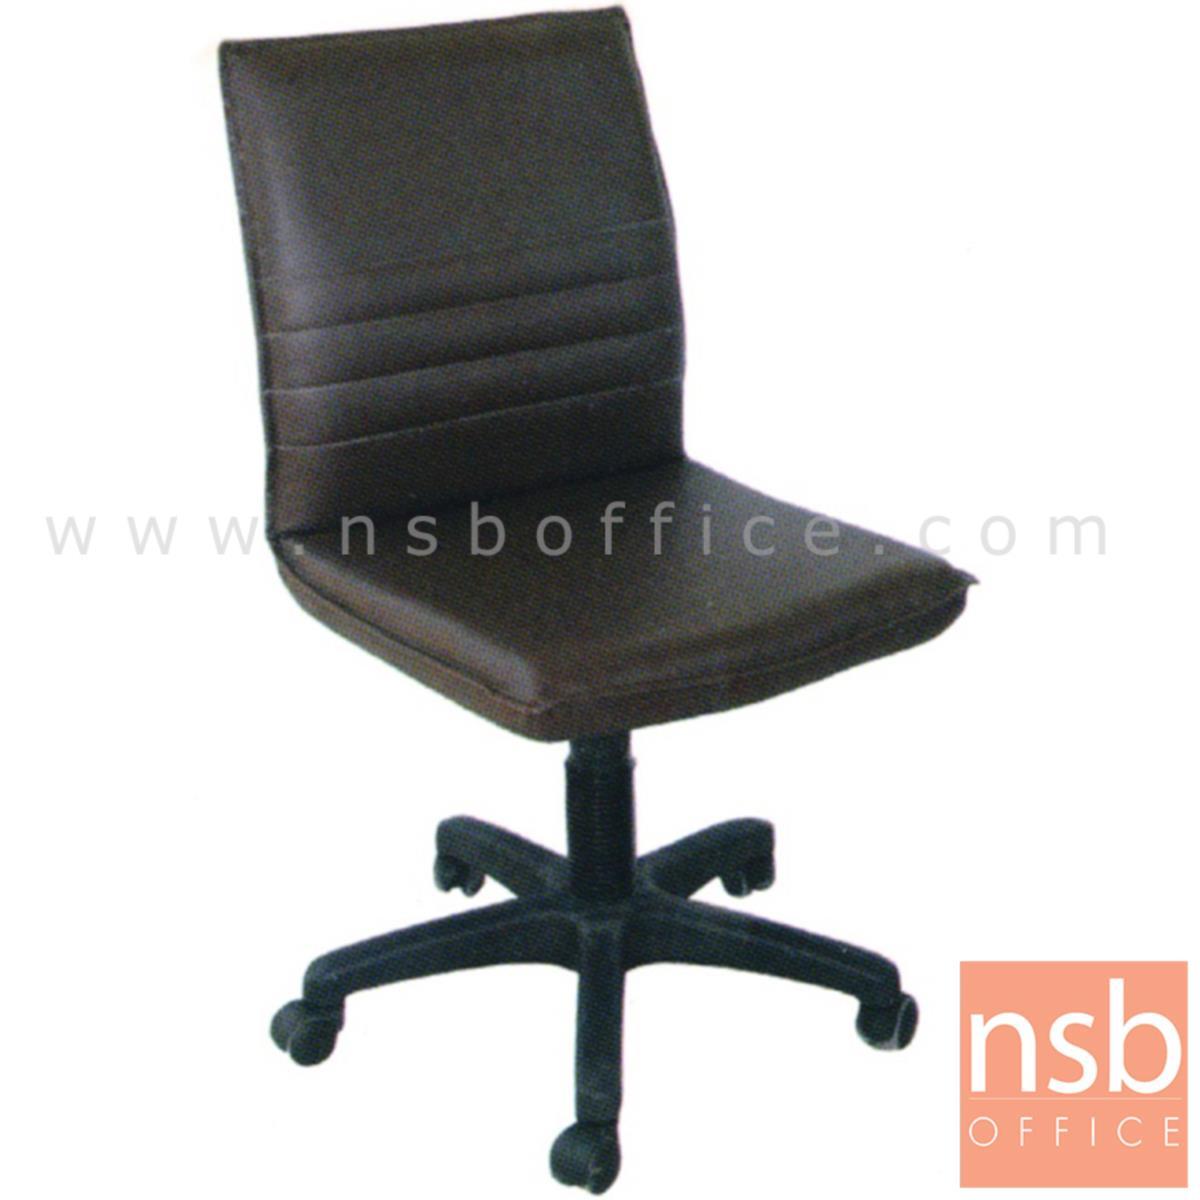 B03A381:เก้าอี้สำนักงาน รุ่น Miller (มิลเลอร์) ไม่มีท้าวแขน